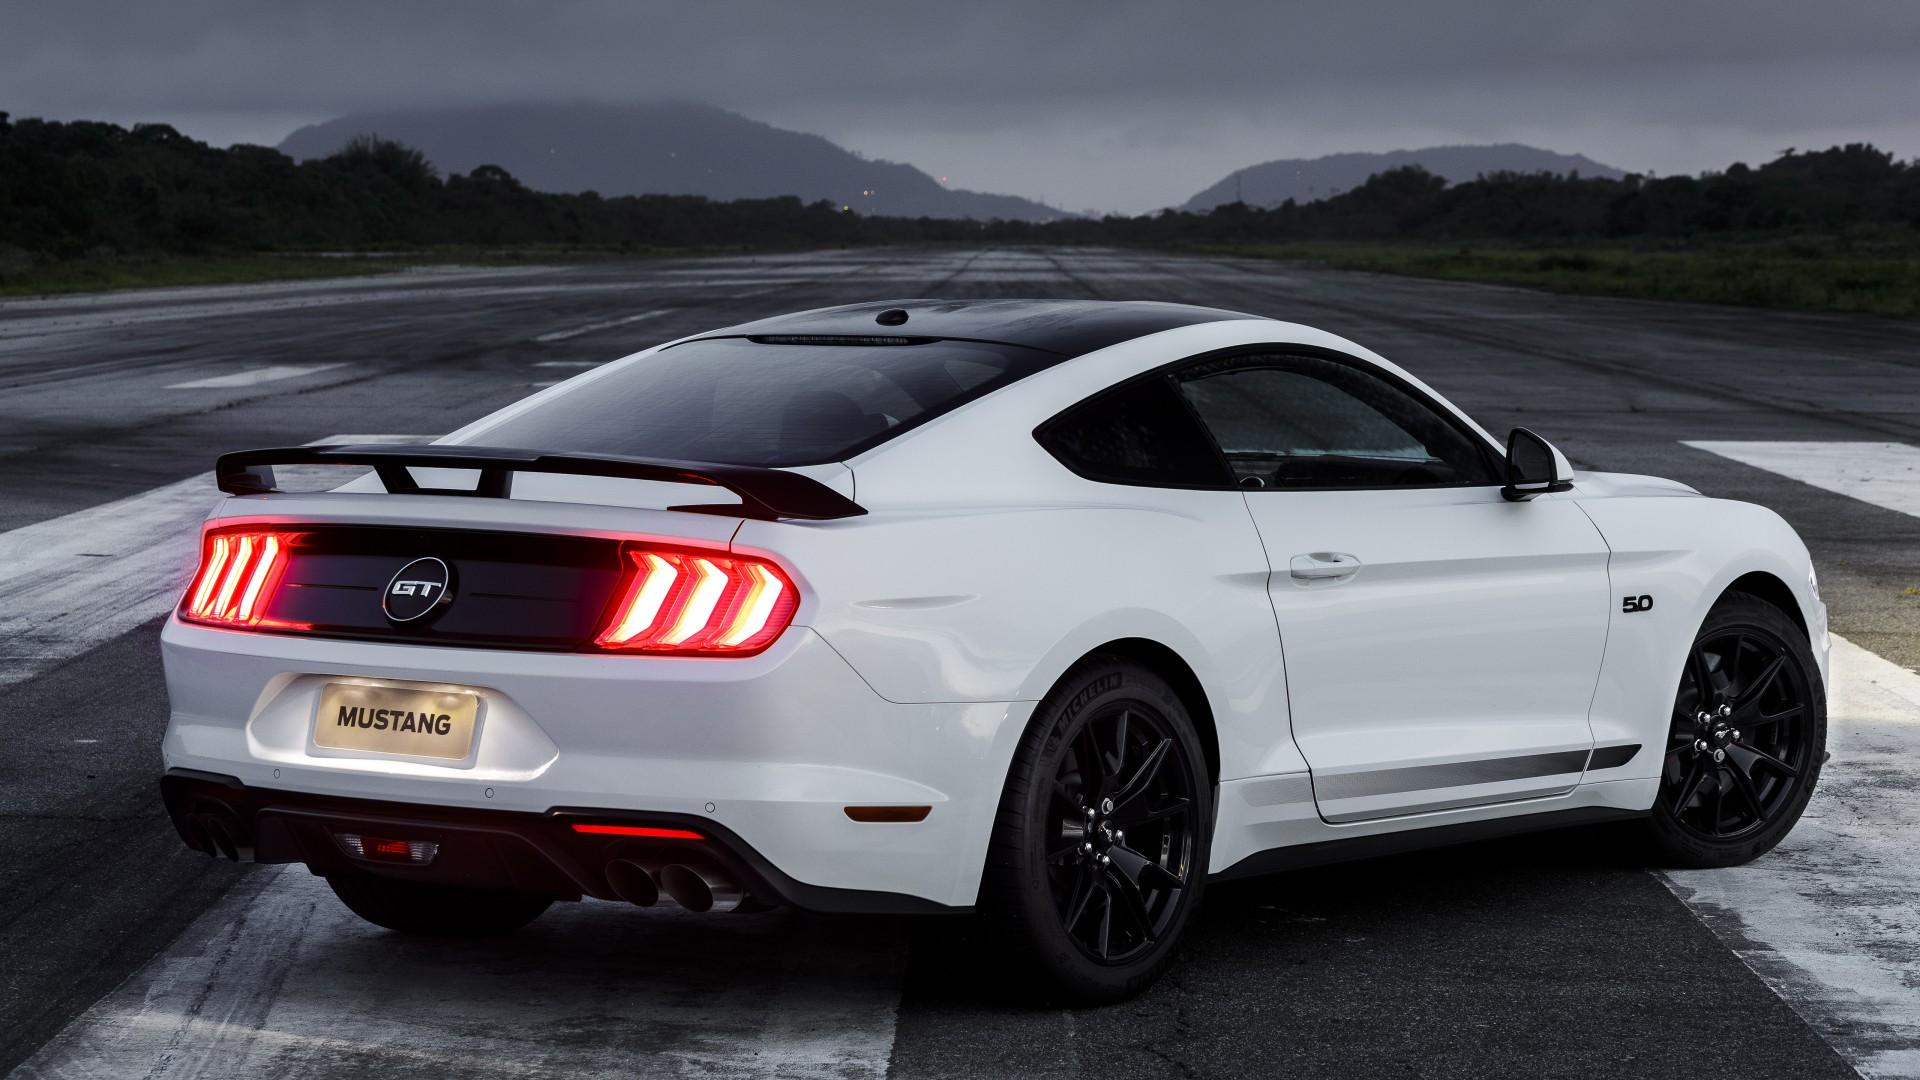 Ford Mustang GT Black Shadow 2019 4K 5K 3 Wallpaper | HD ...